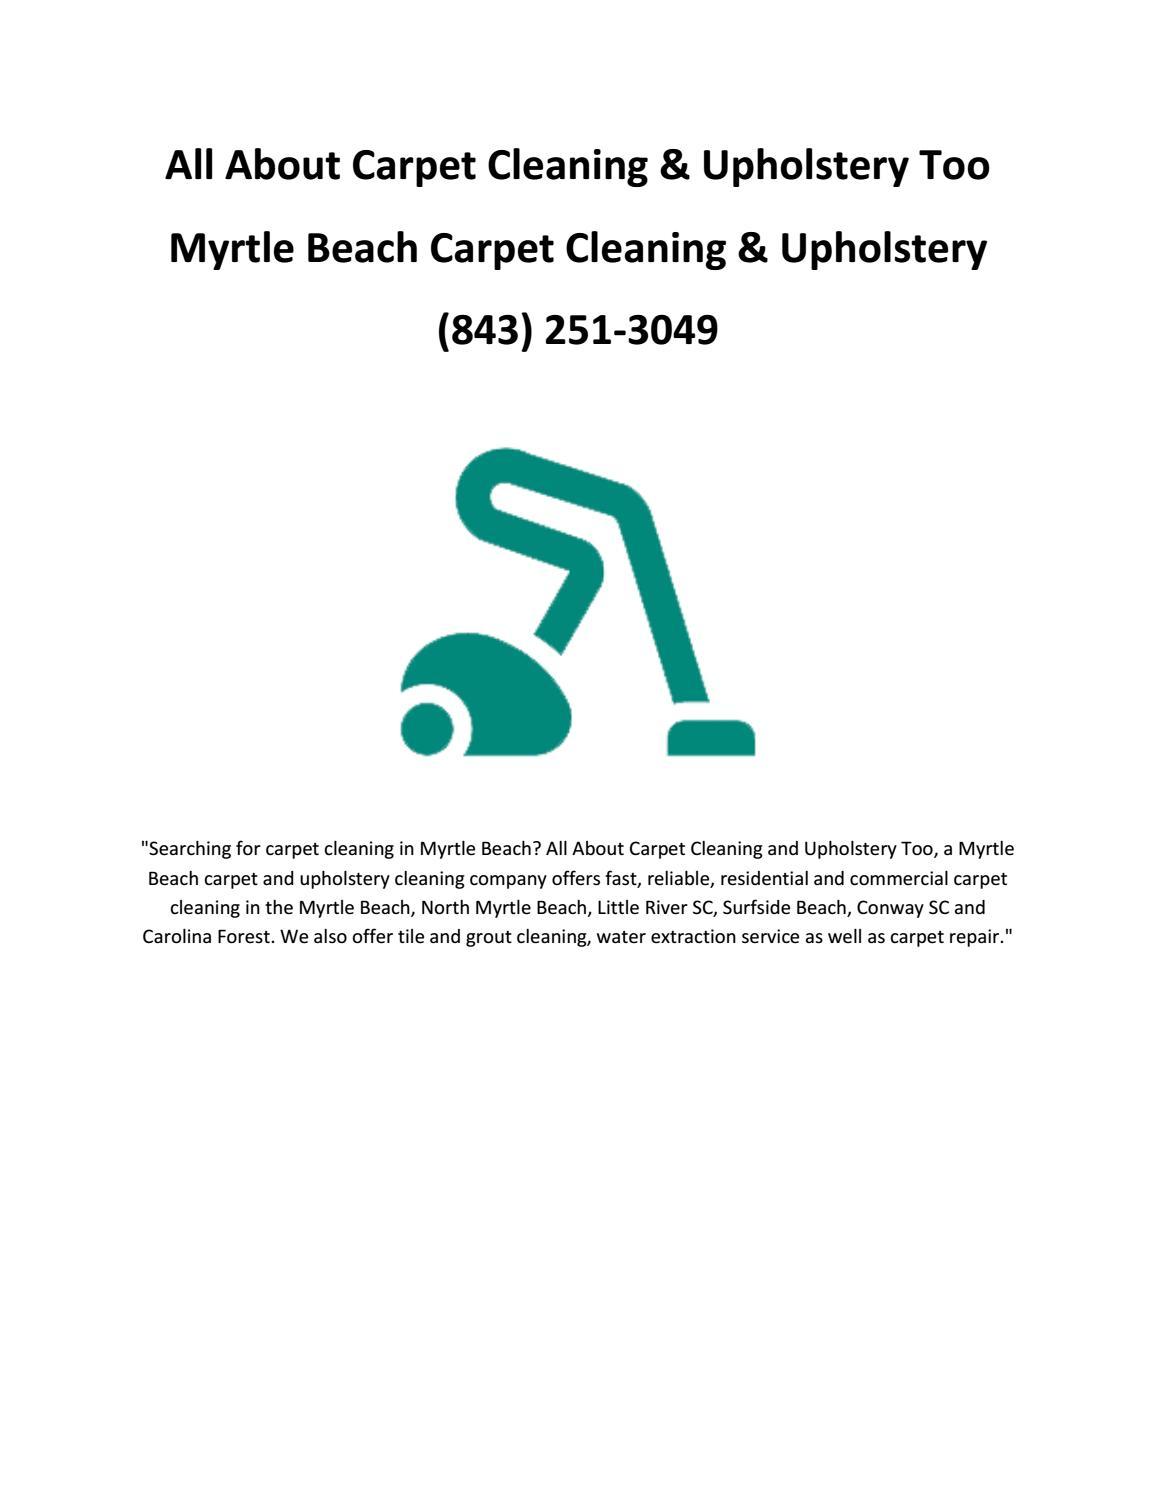 carpet cleaning myrtle beach myrtle